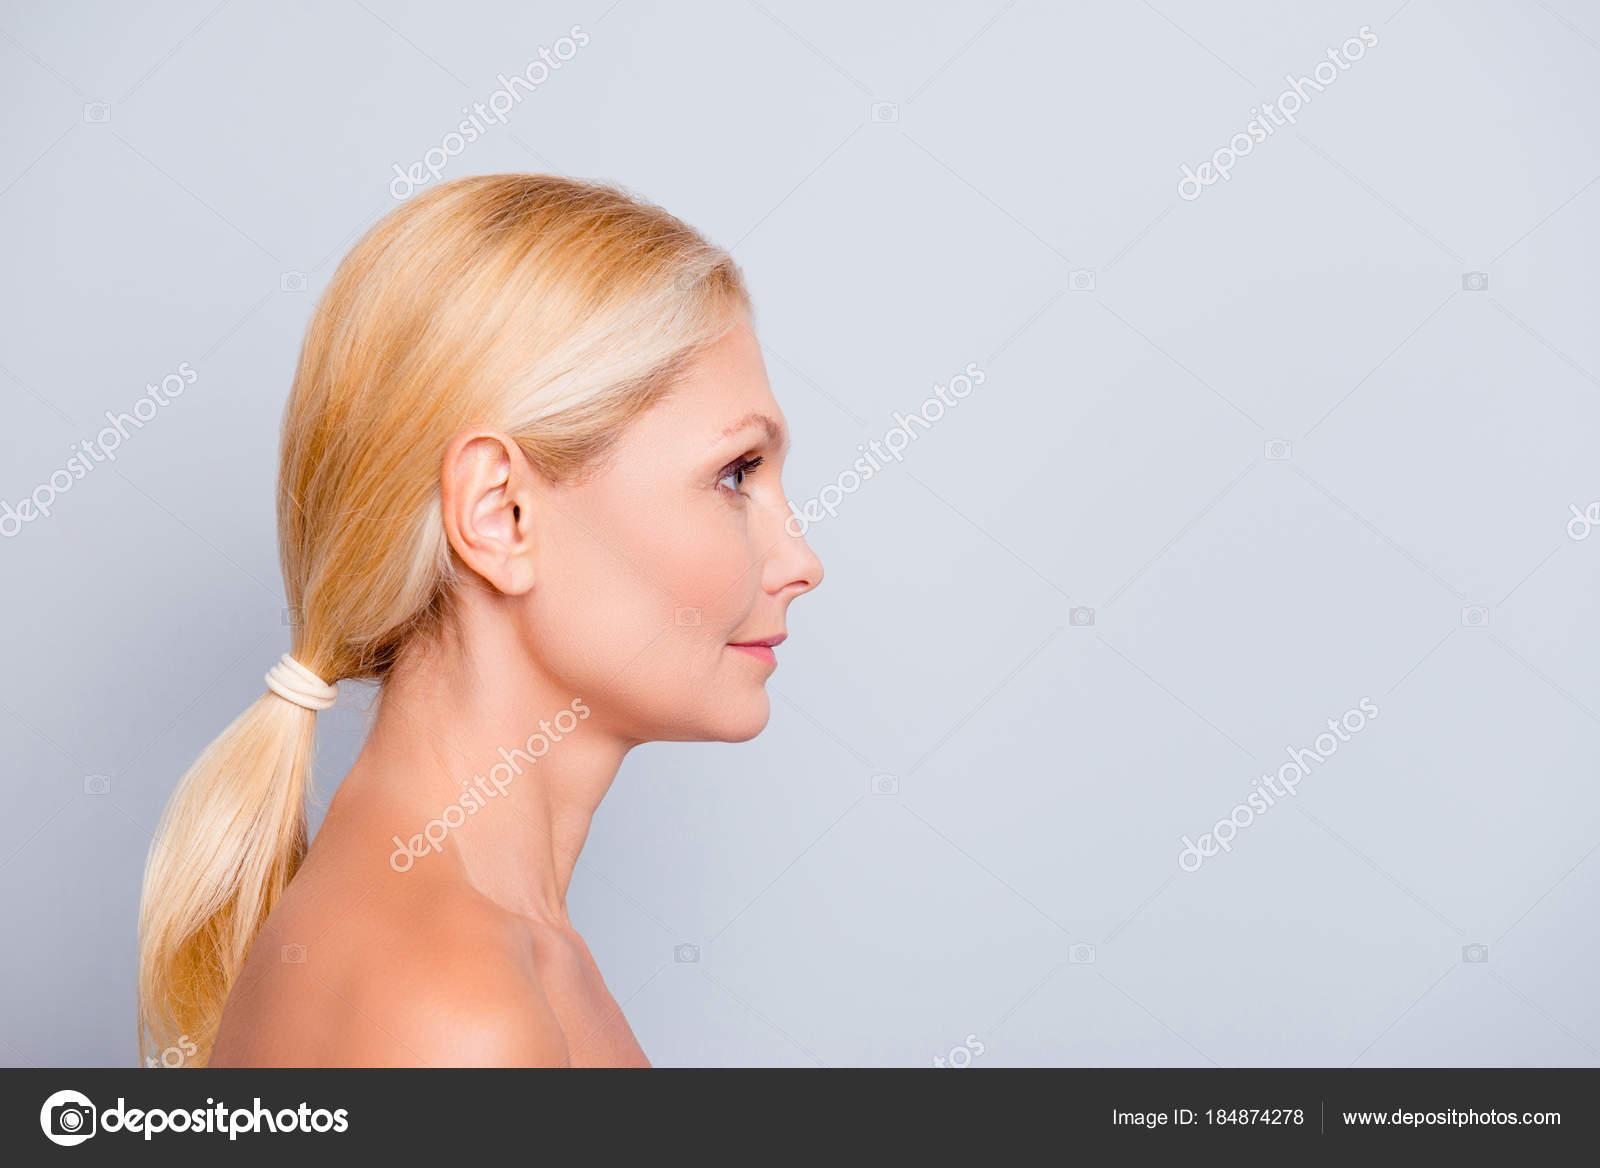 Advertisement Concept Side View Profile Half Face